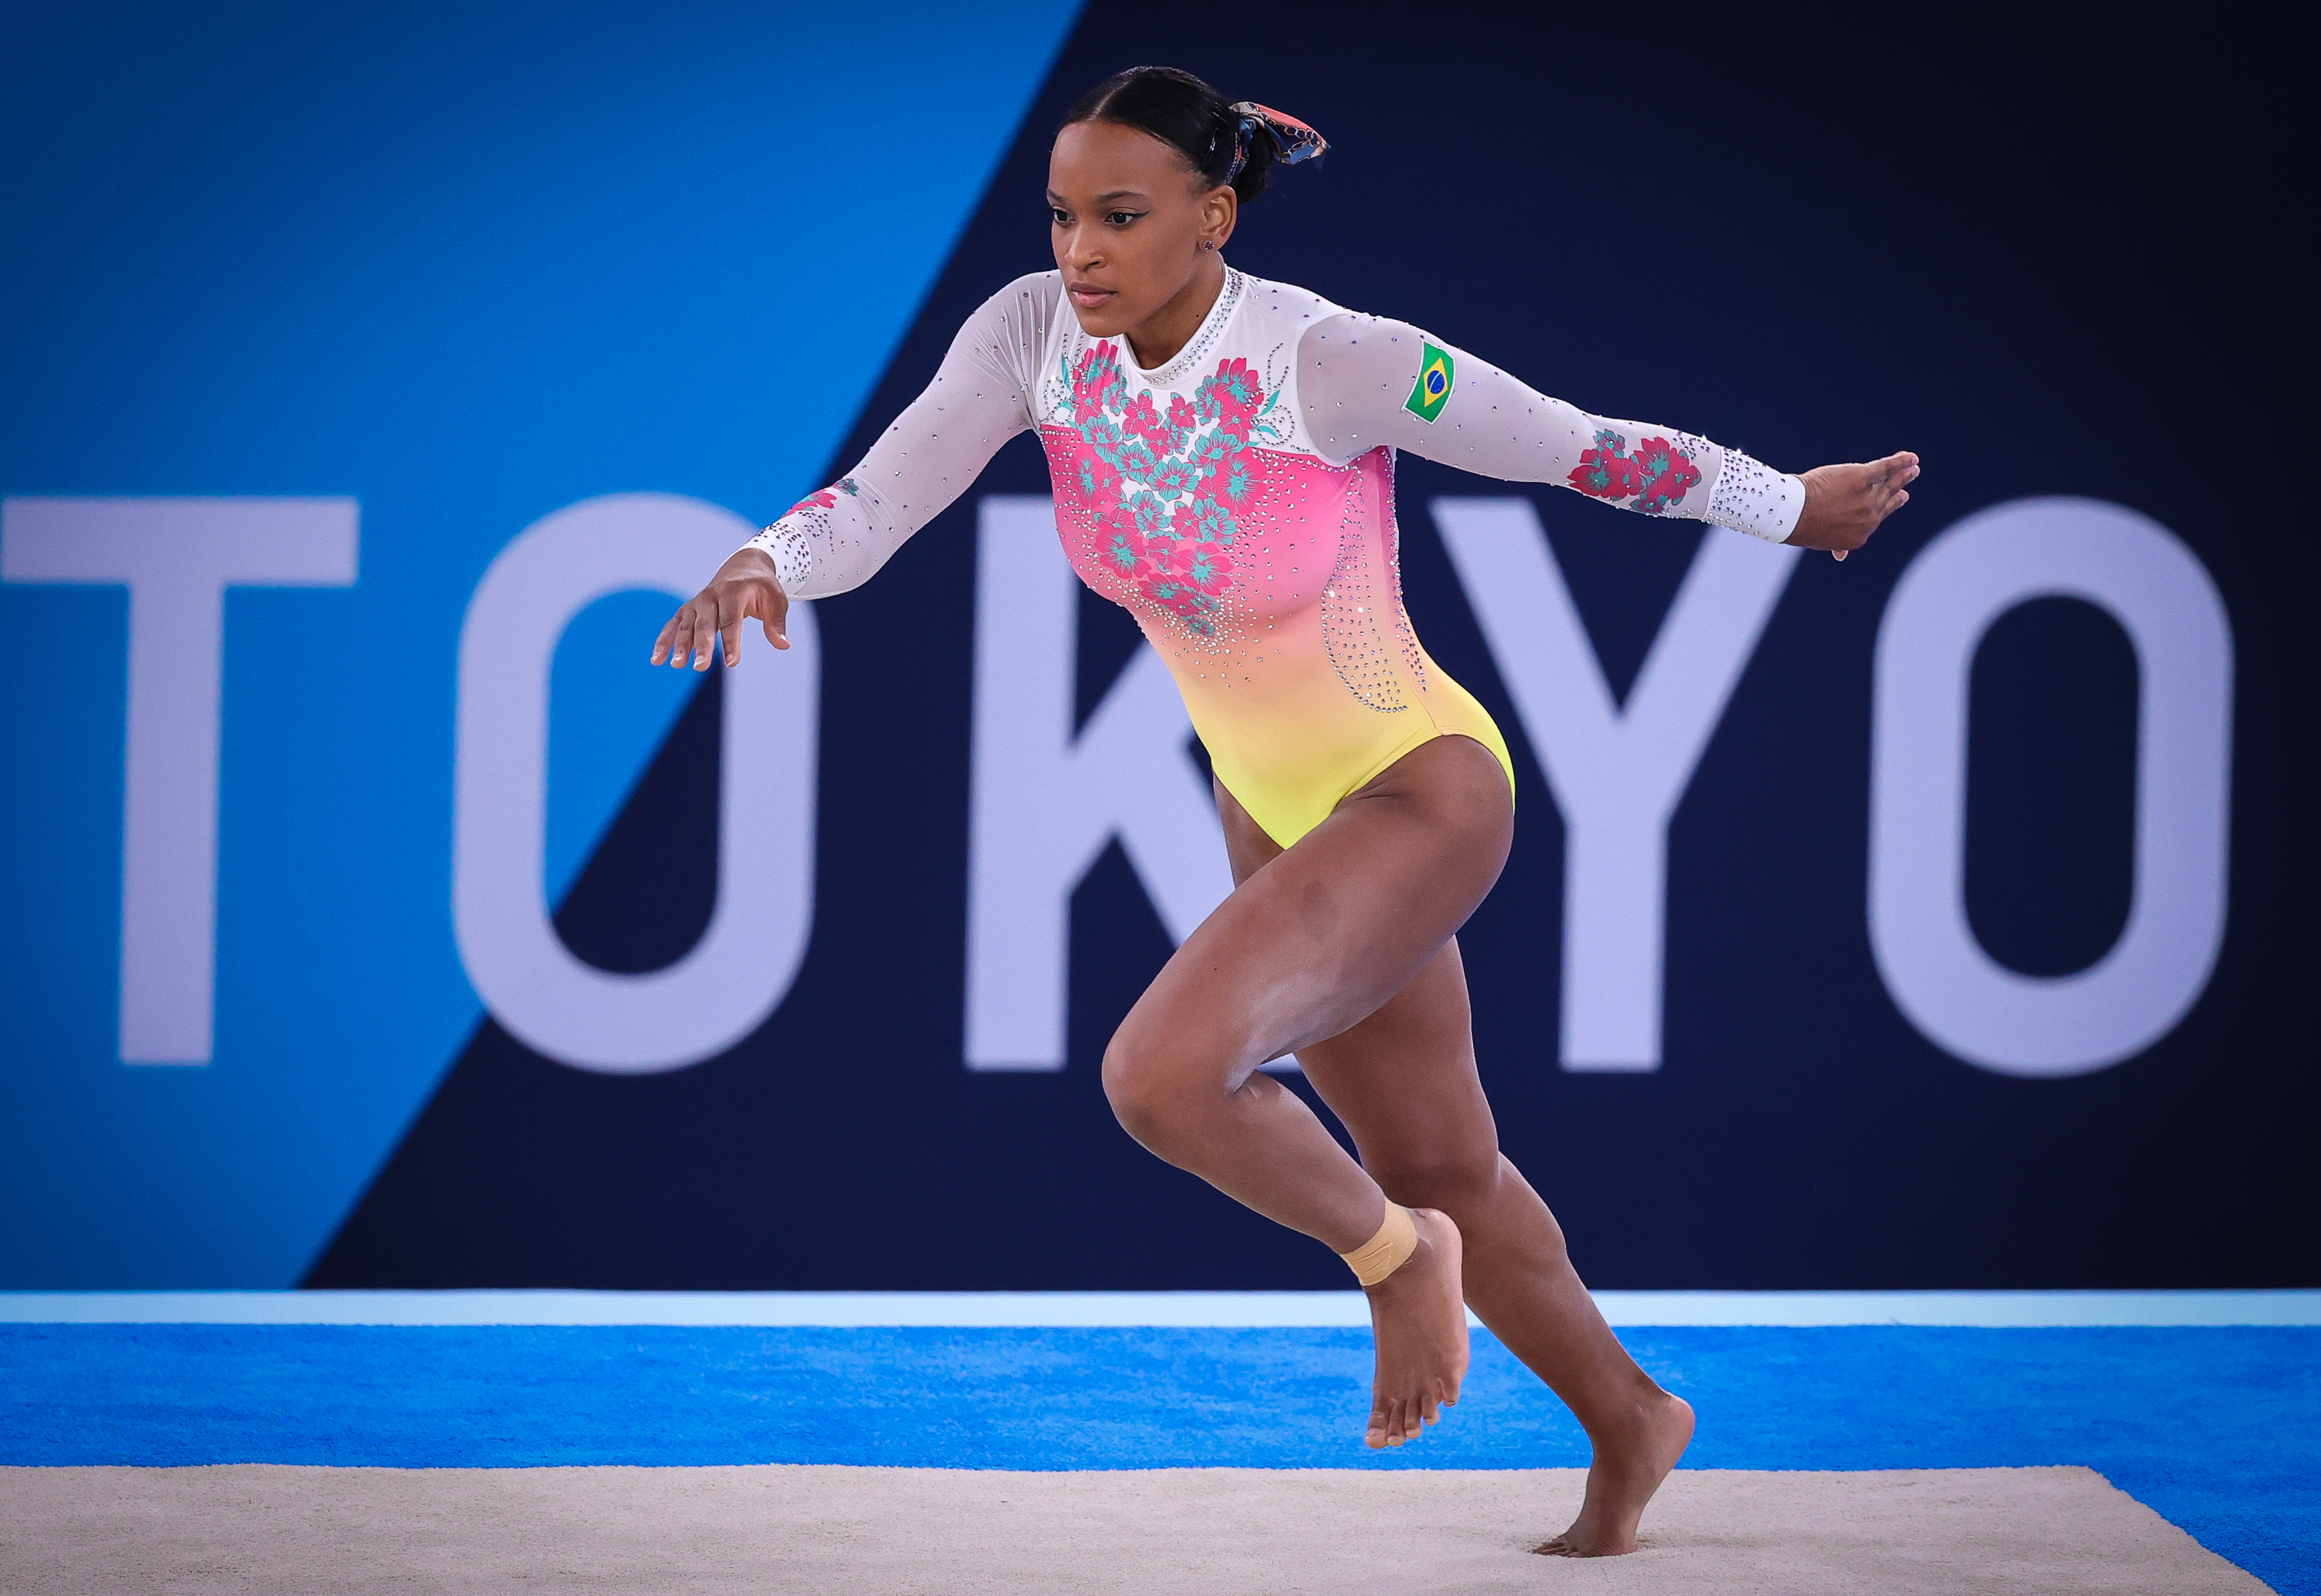 02.08.2021 - Jogos Olímpicos Tóquio 2020 - Ginástica Artística Feminina. Final do solo. Na foto a atleta Rebeca Andrade durante a final do solo.